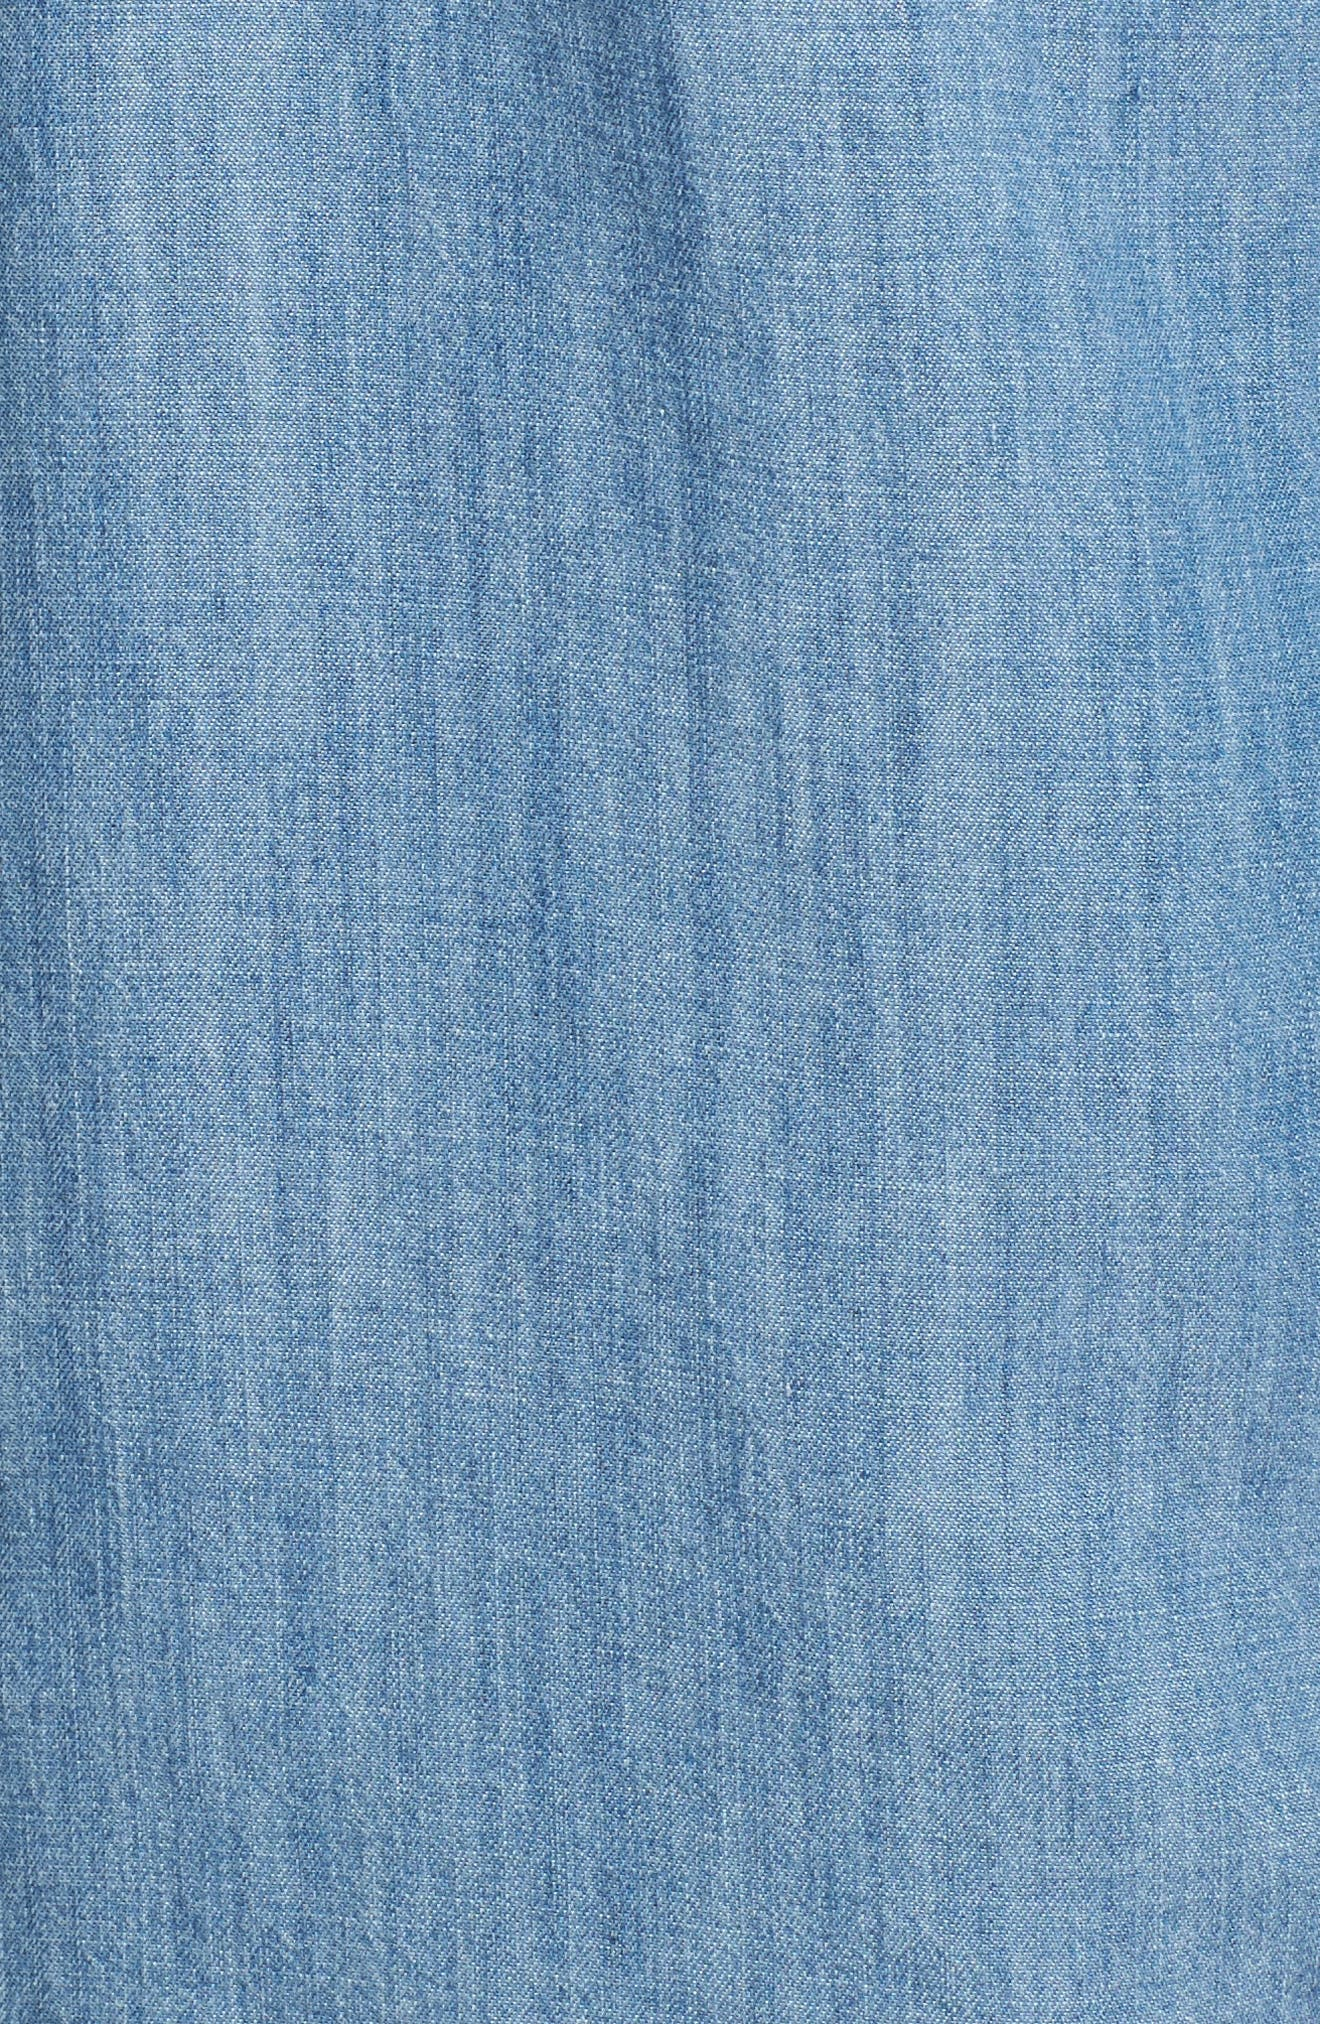 Colton Denim Shirt,                             Alternate thumbnail 5, color,                             MEDIUM VINTAGE WASH